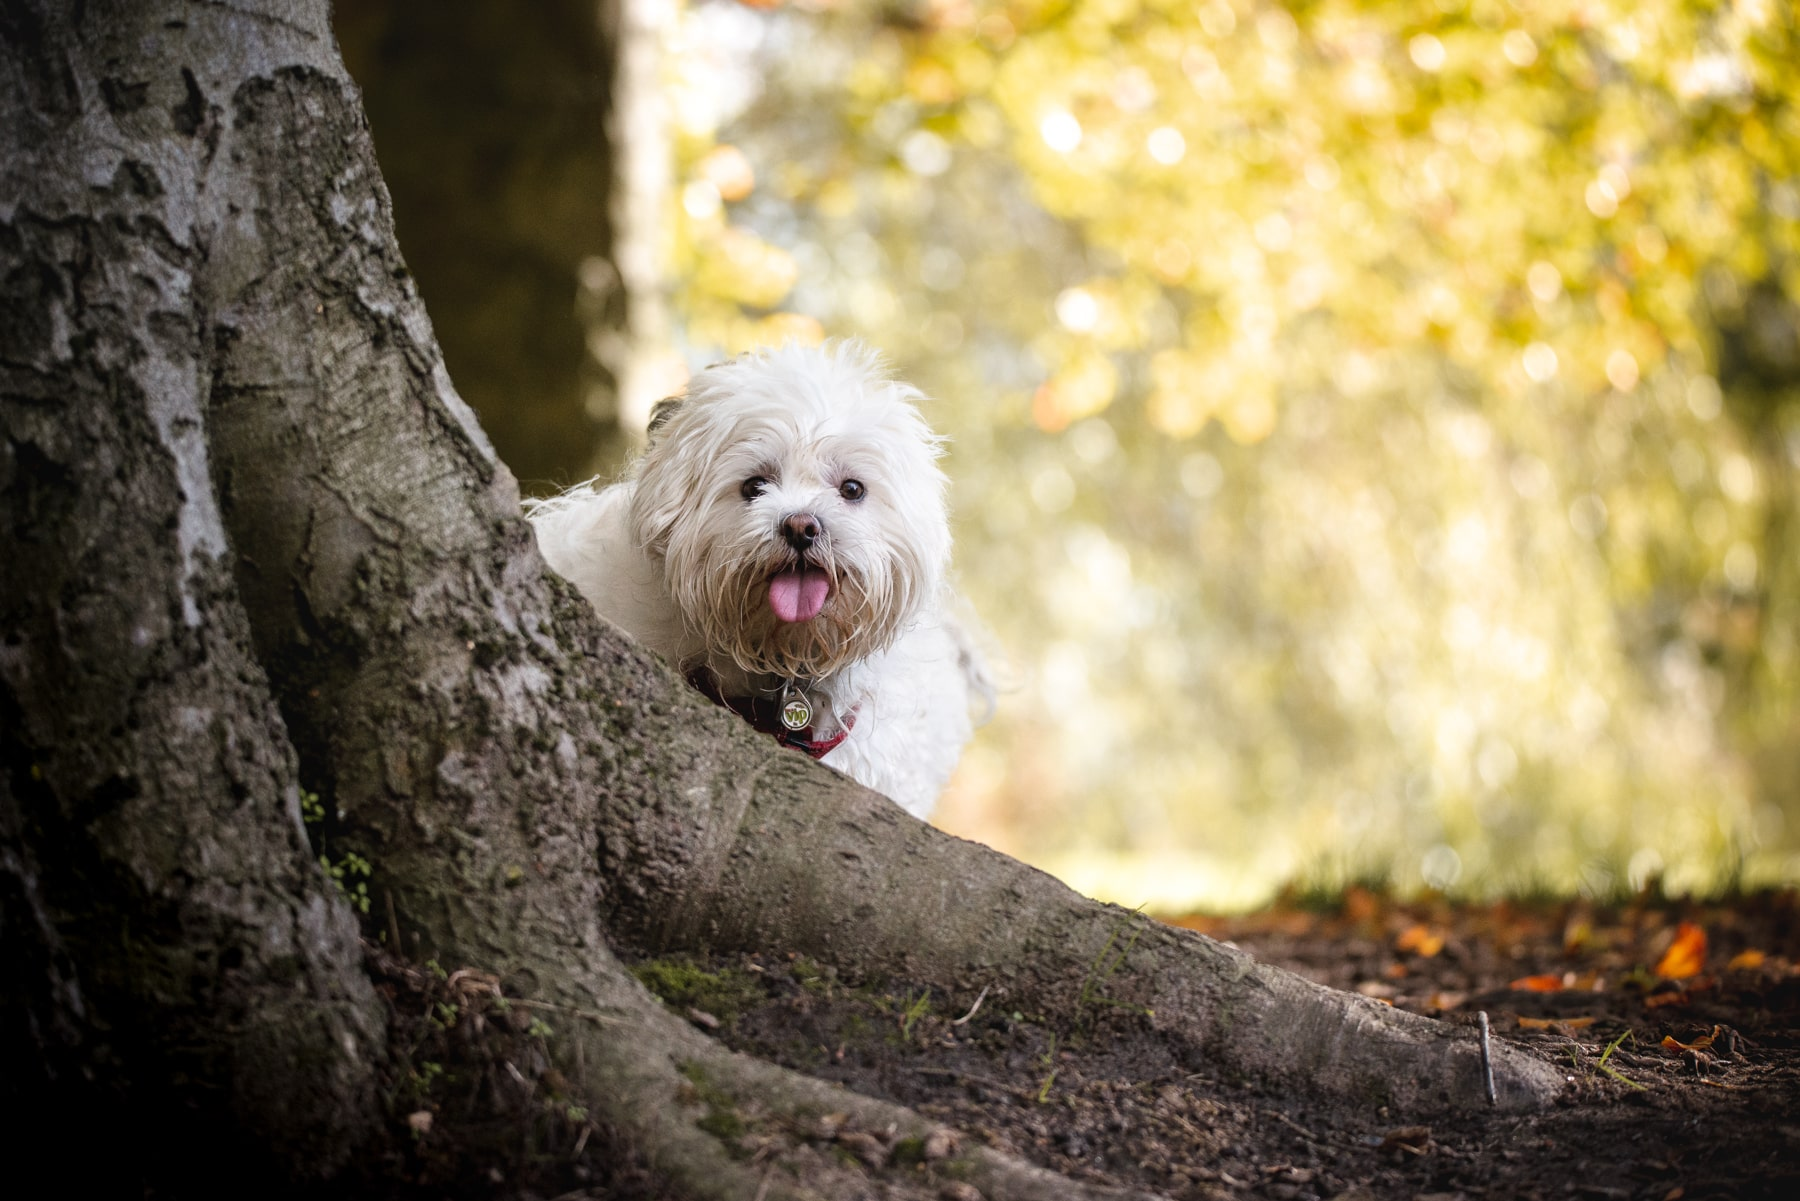 Autumn Dog portrait - Copyright 2018 Diffuse Photo